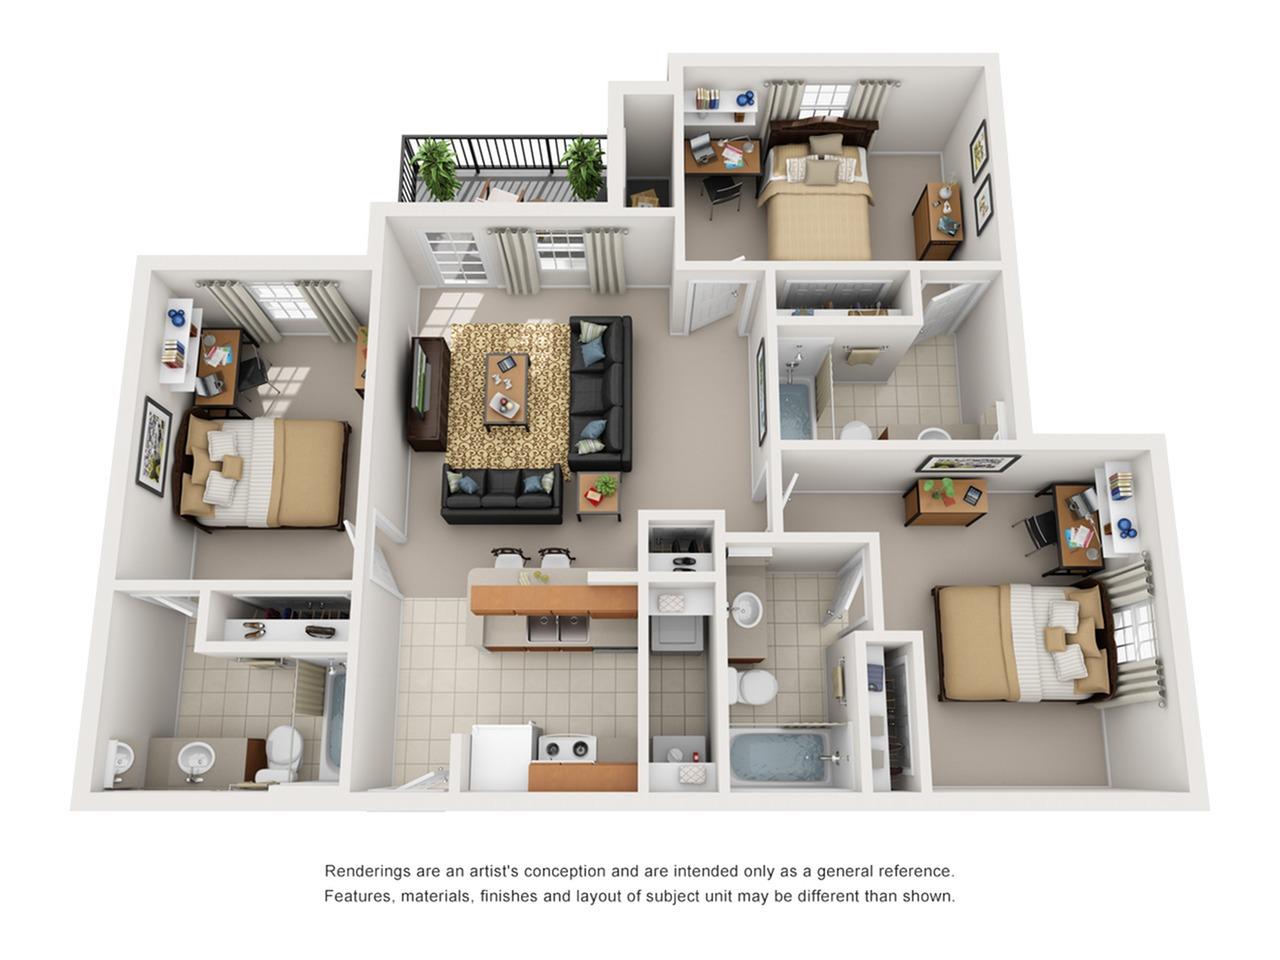 3 bedroom apartments tucson